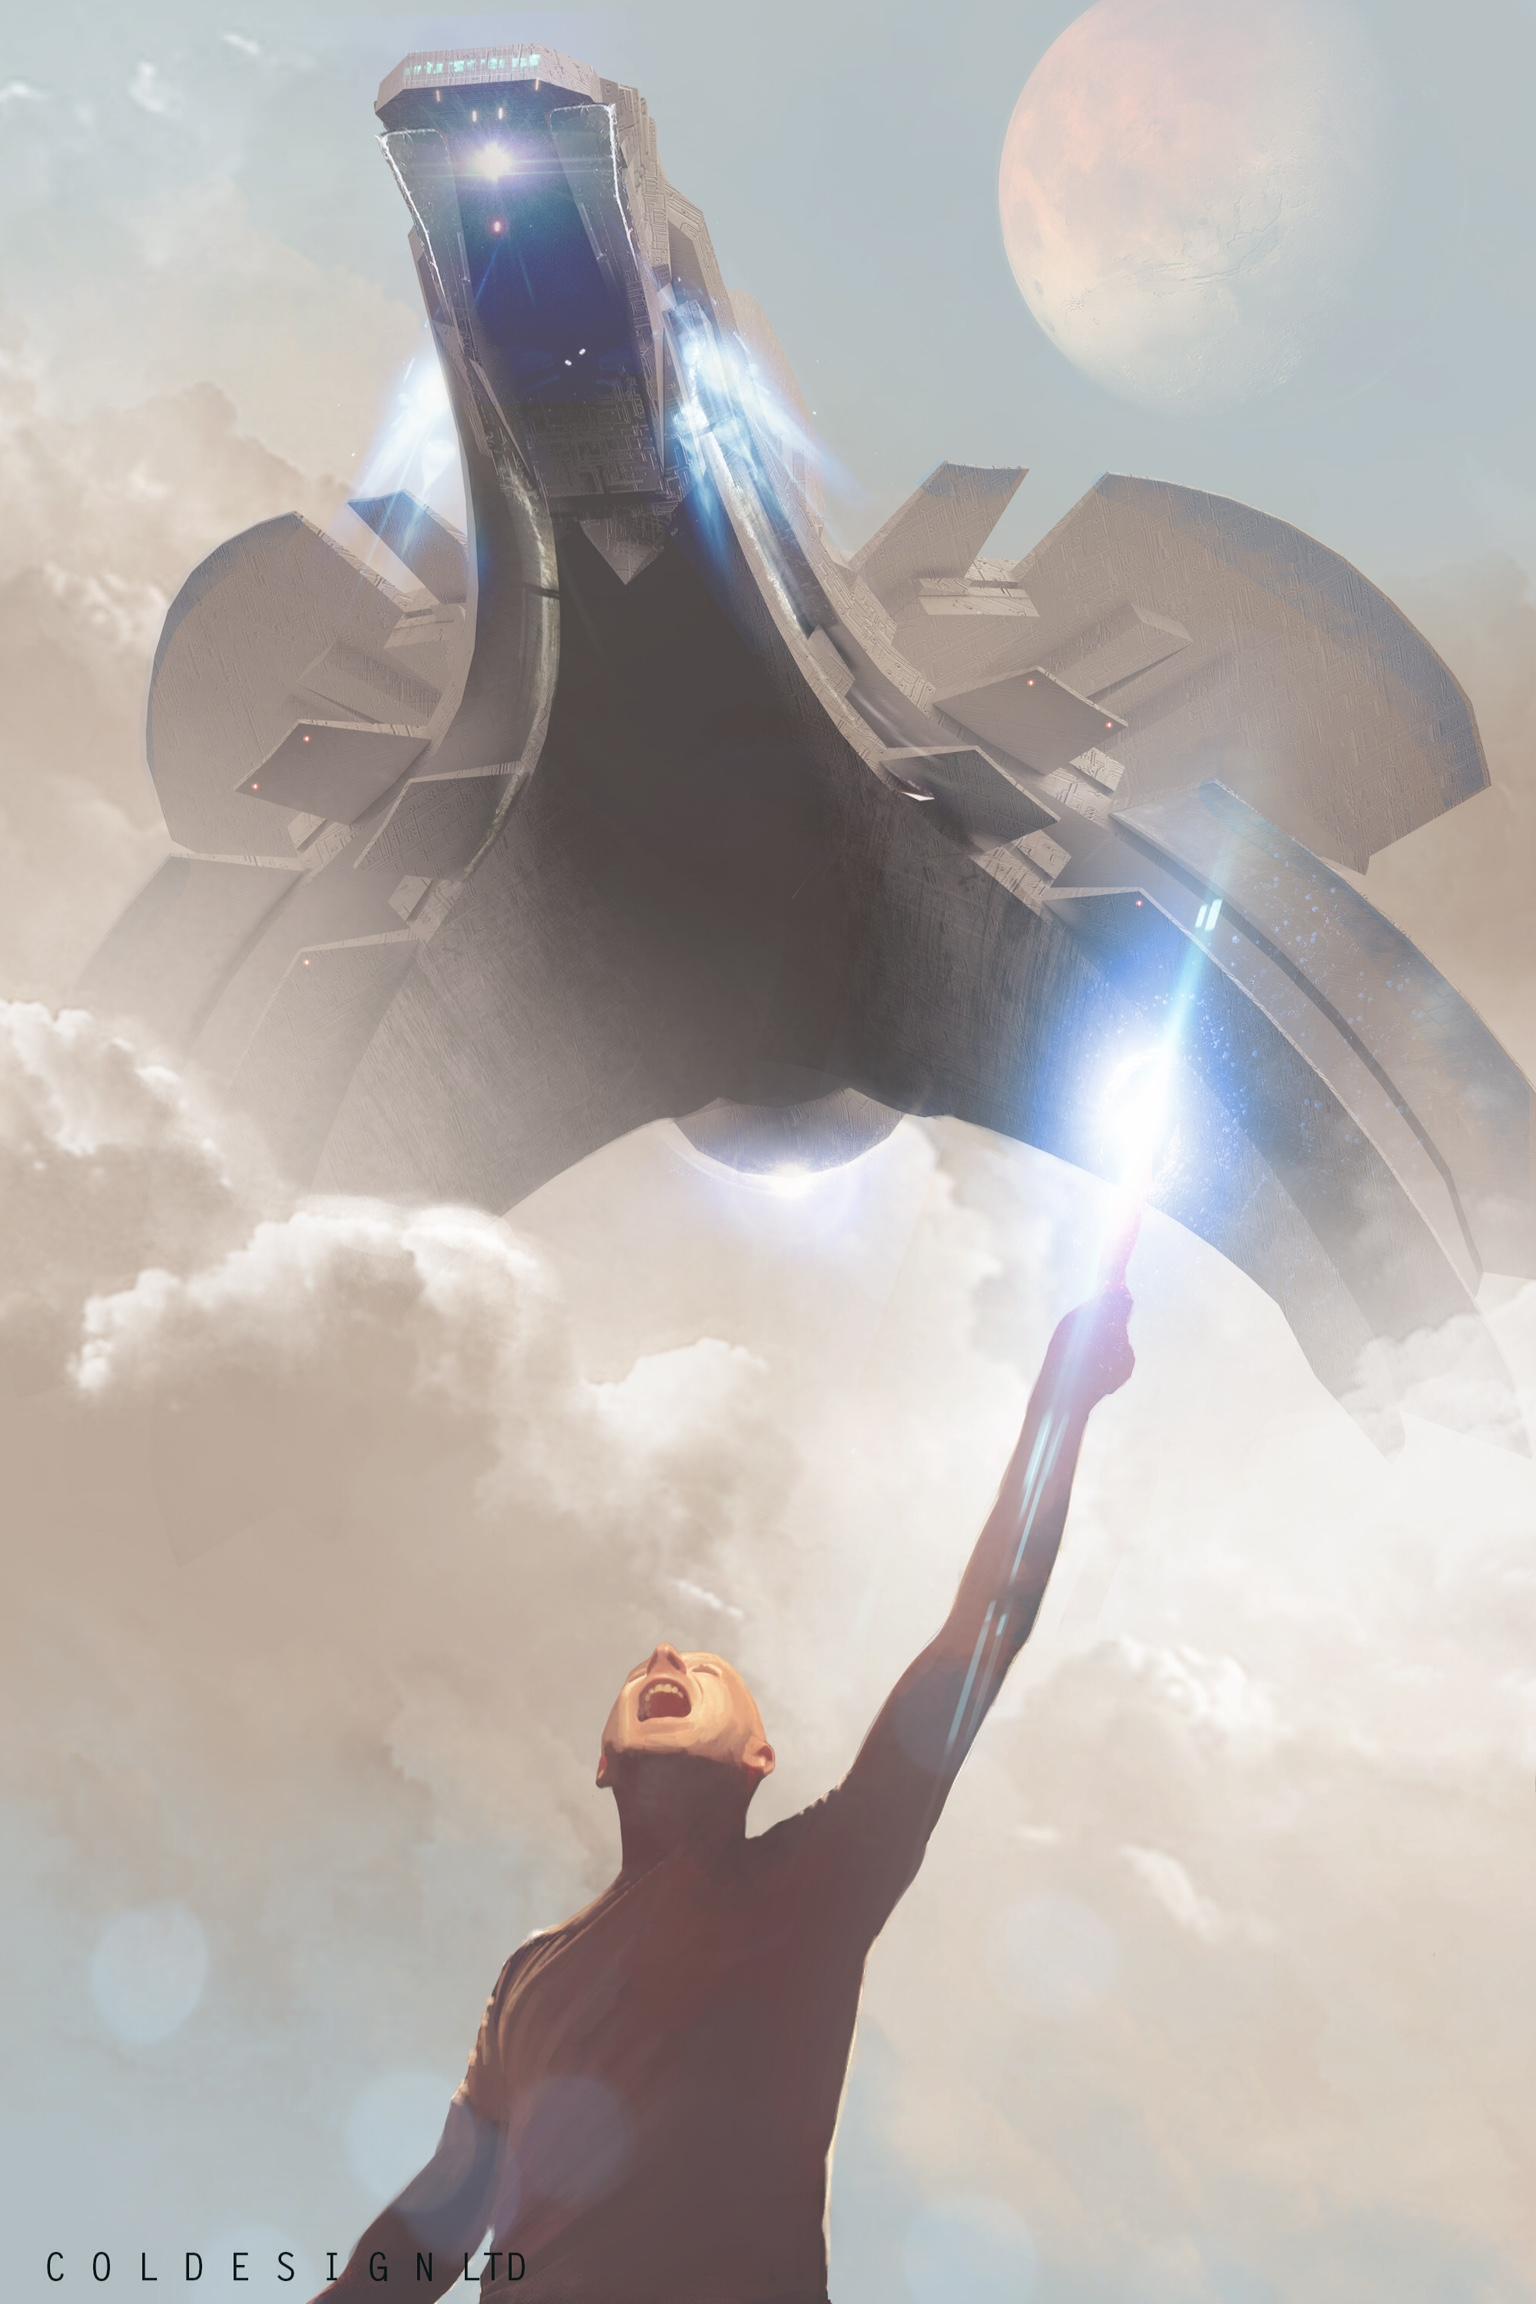 The Amazing Digital Sci-Fi Art of Col Price   Concept Artist